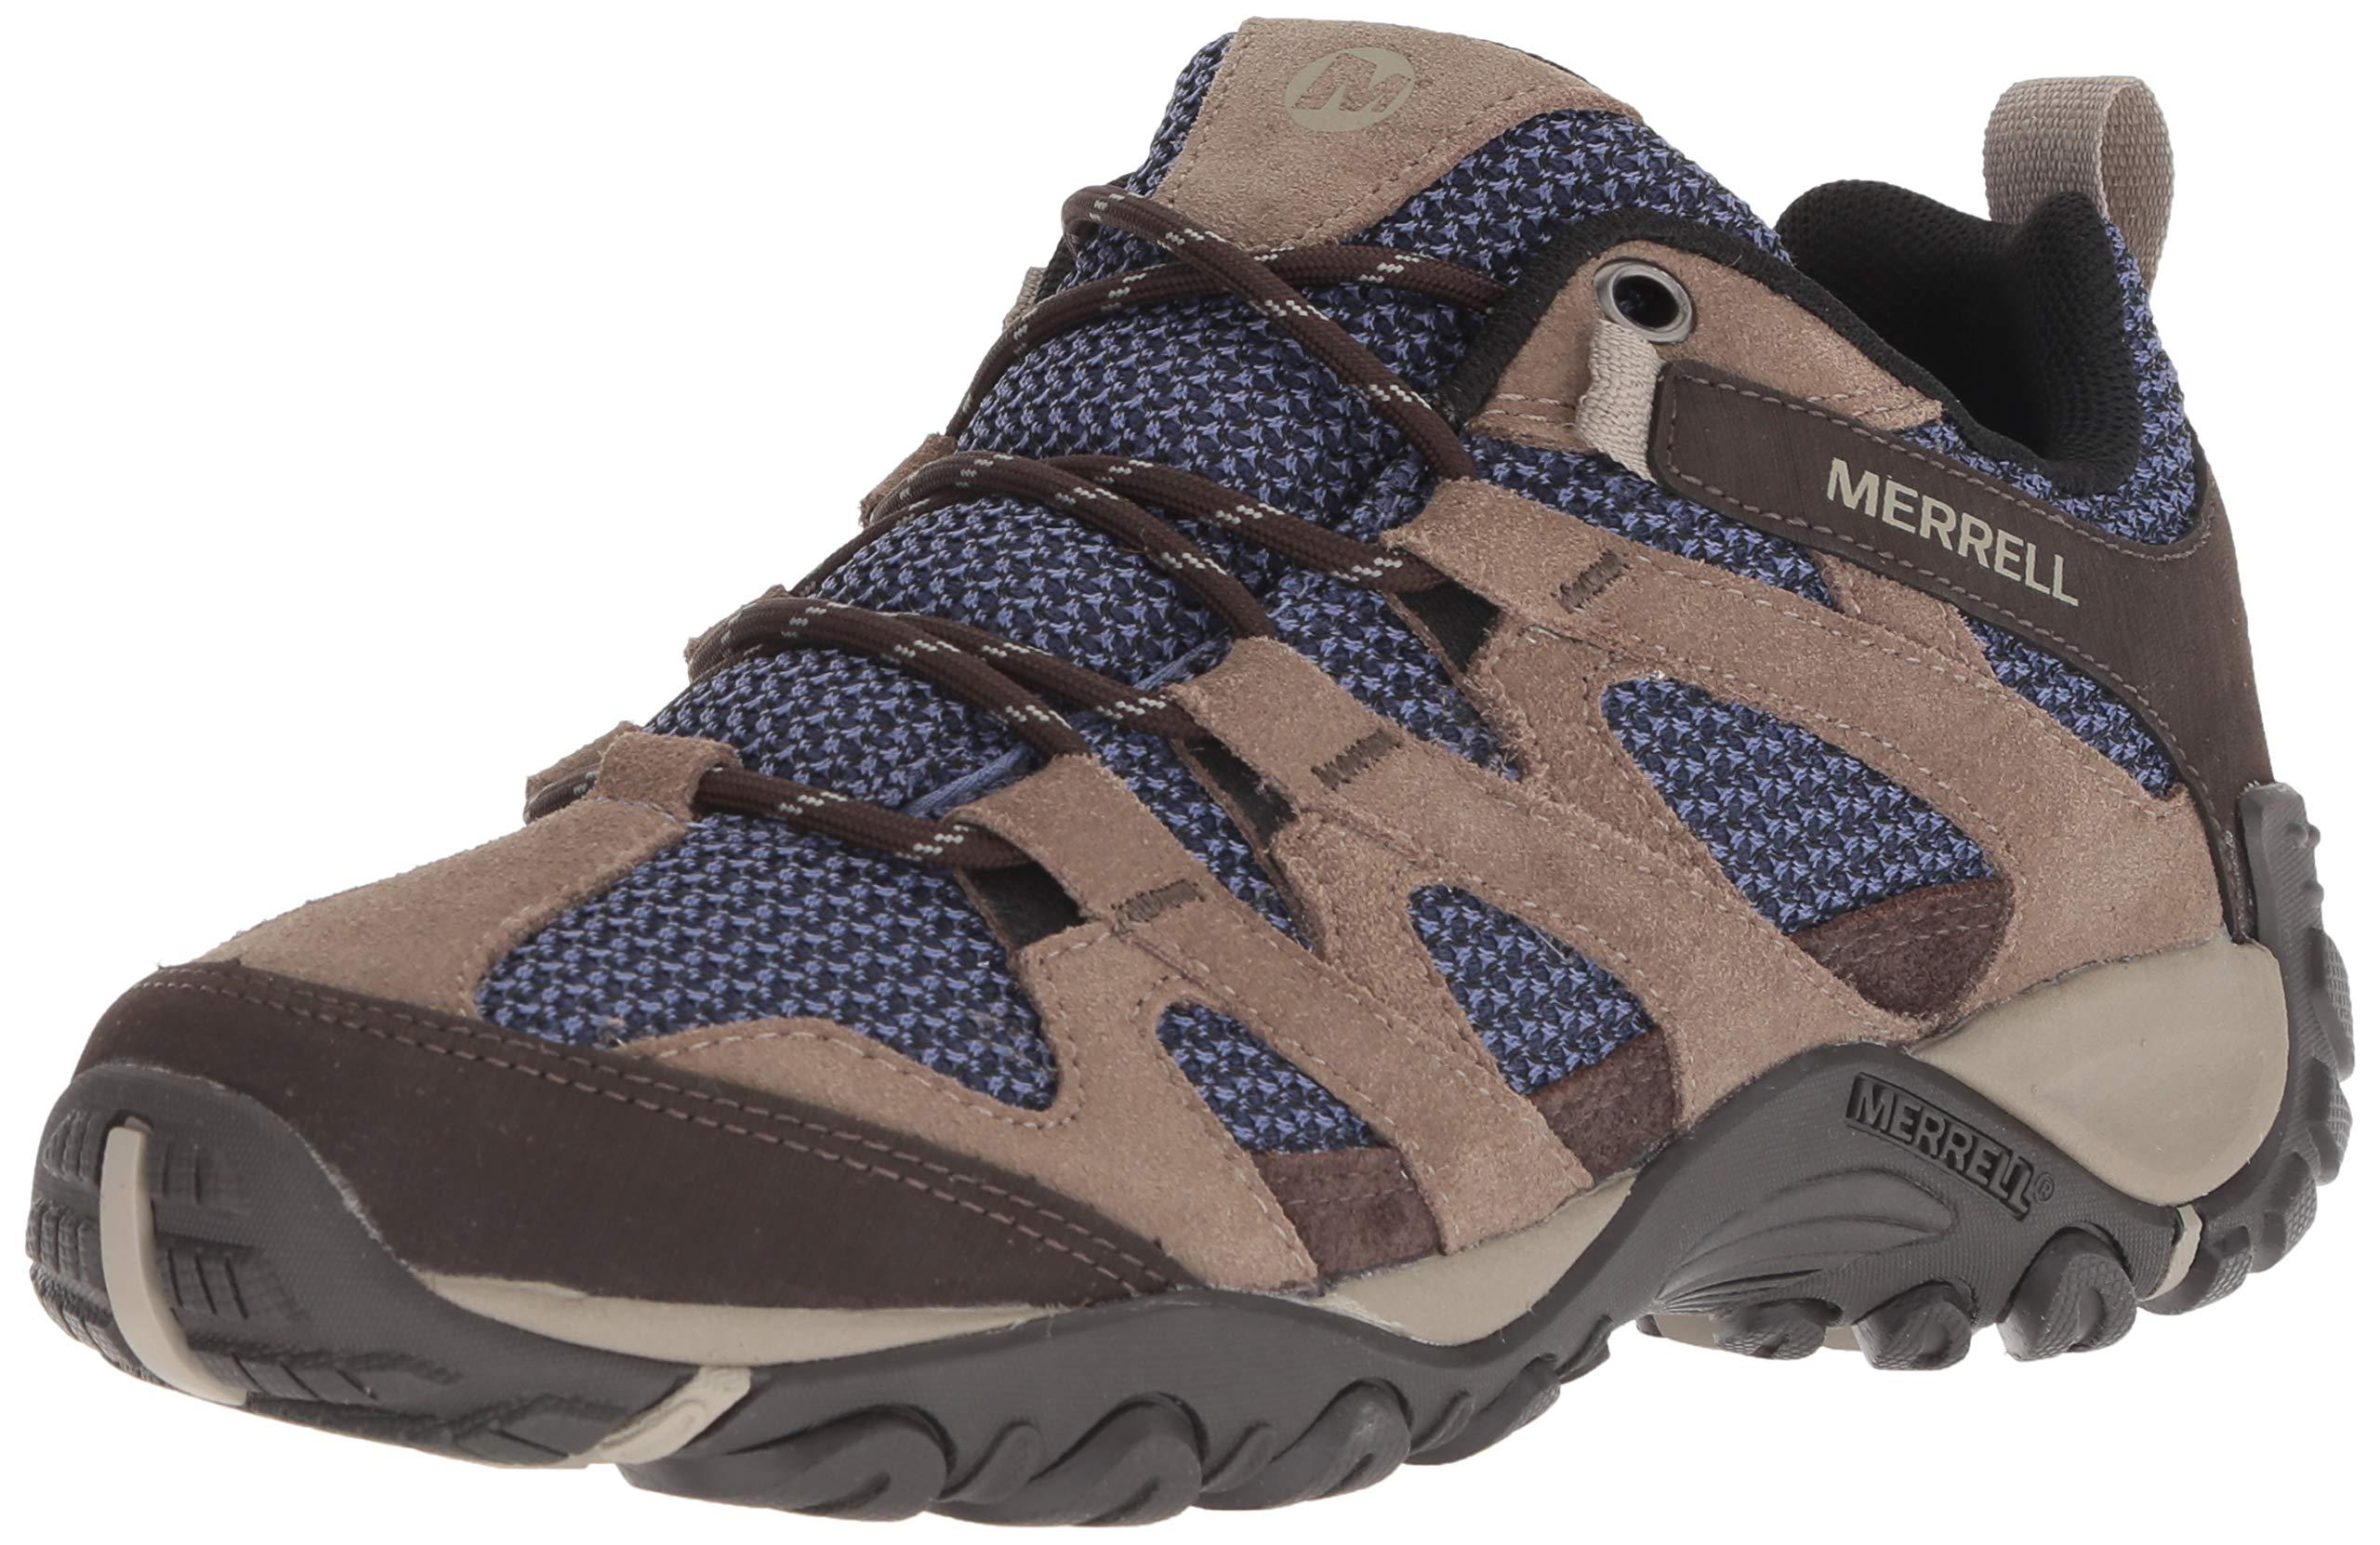 Merrell Women's Alverstone Hiking Shoe